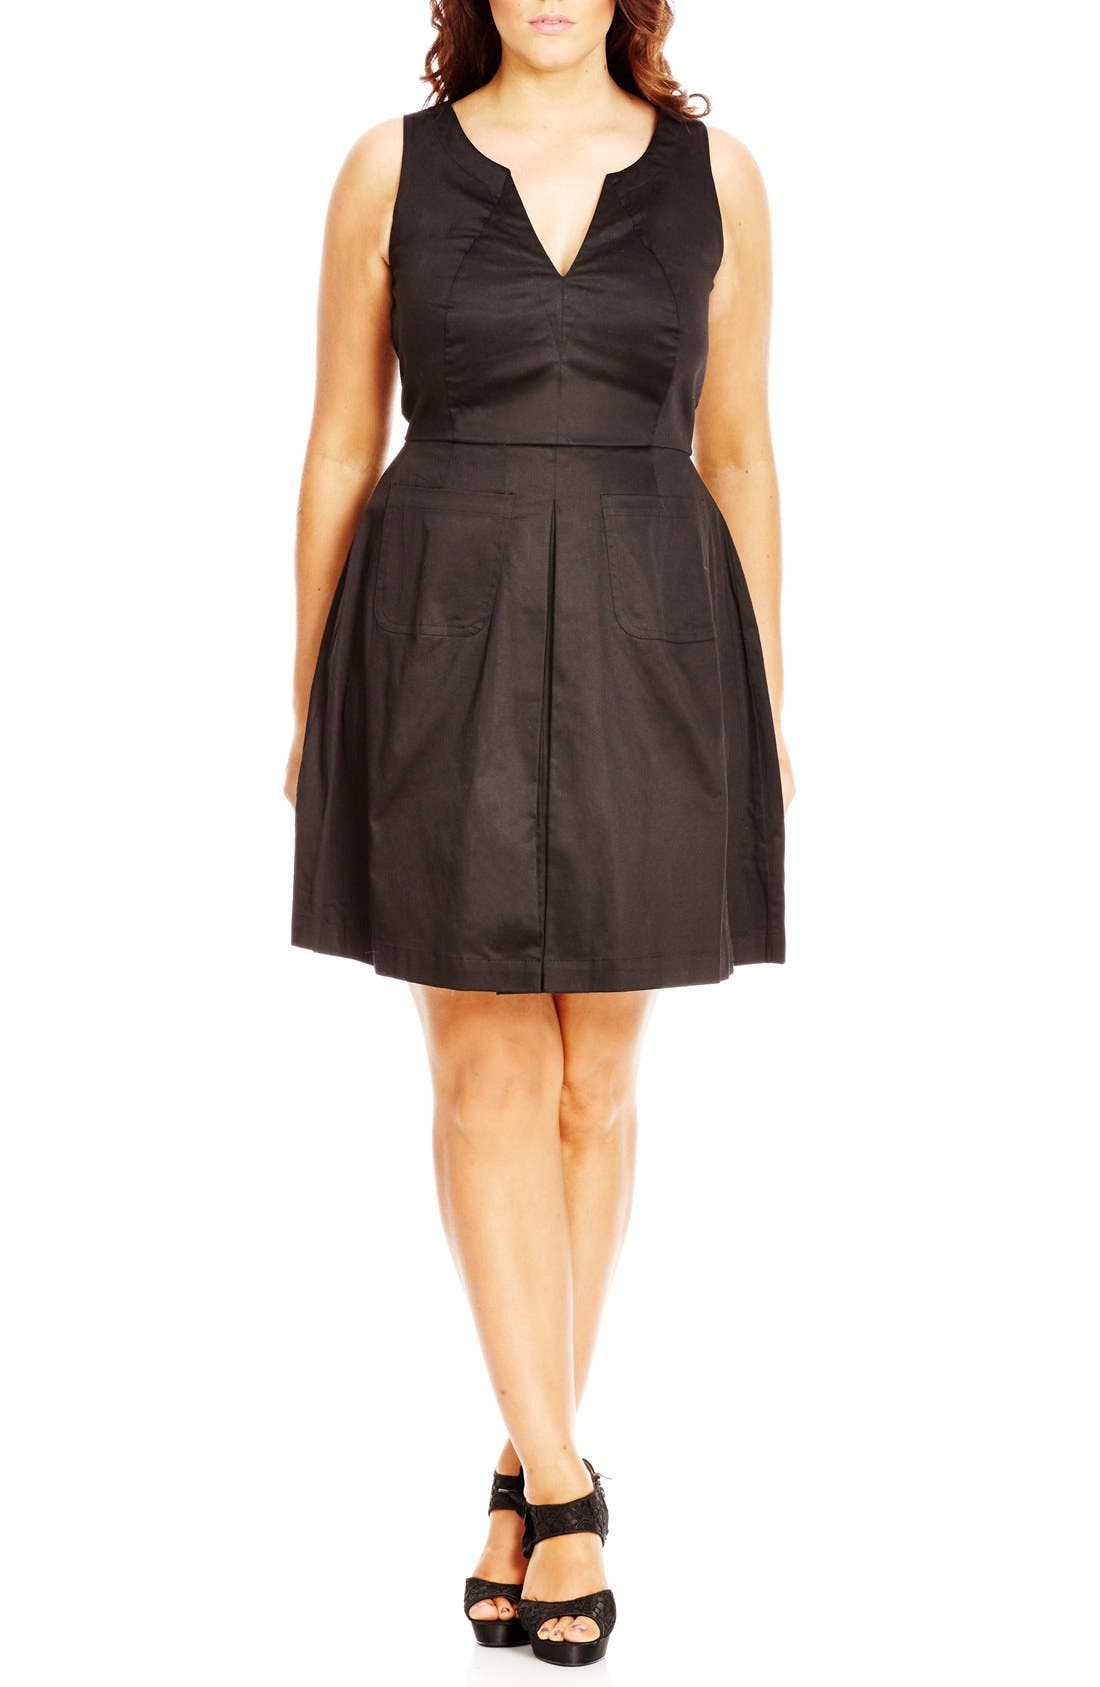 Main Image - City Chic 'Mod Madness' Notch Neck Fit & Flare Dress (Plus Size)